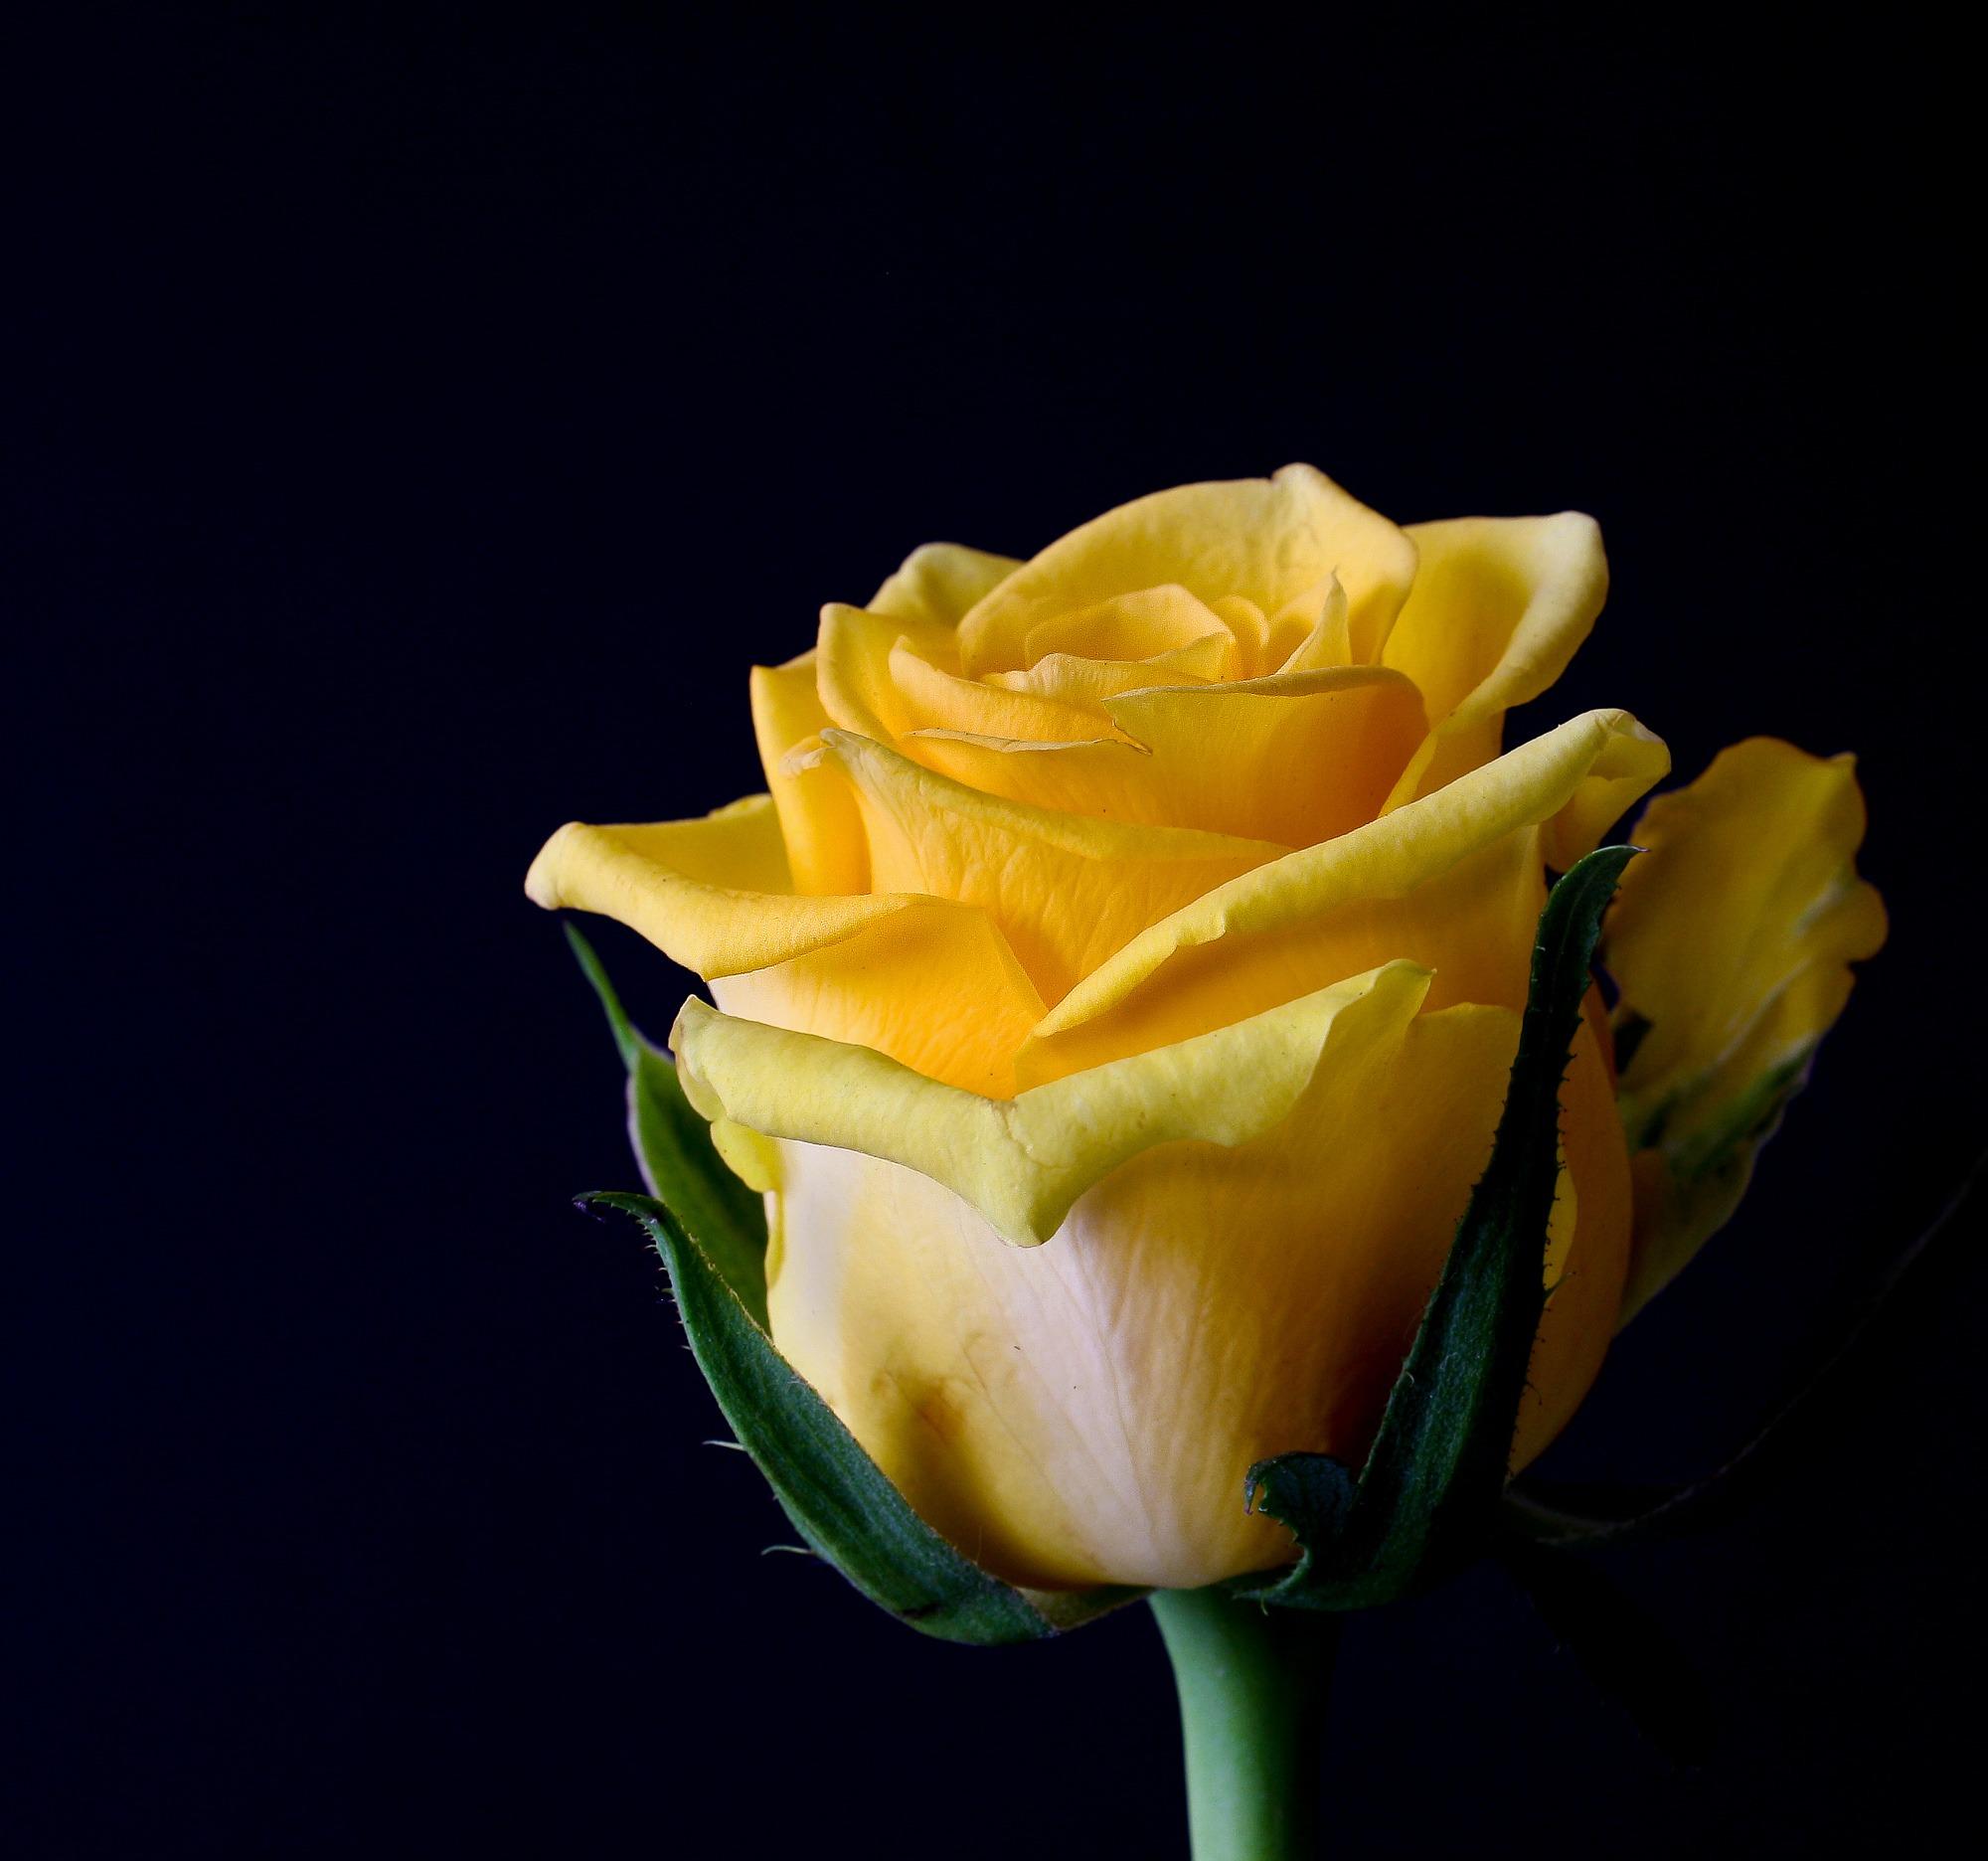 menanam bunga daun bunga mawar kuning bunga bunga mawar naik mekar fotografi makro tanaman berbunga